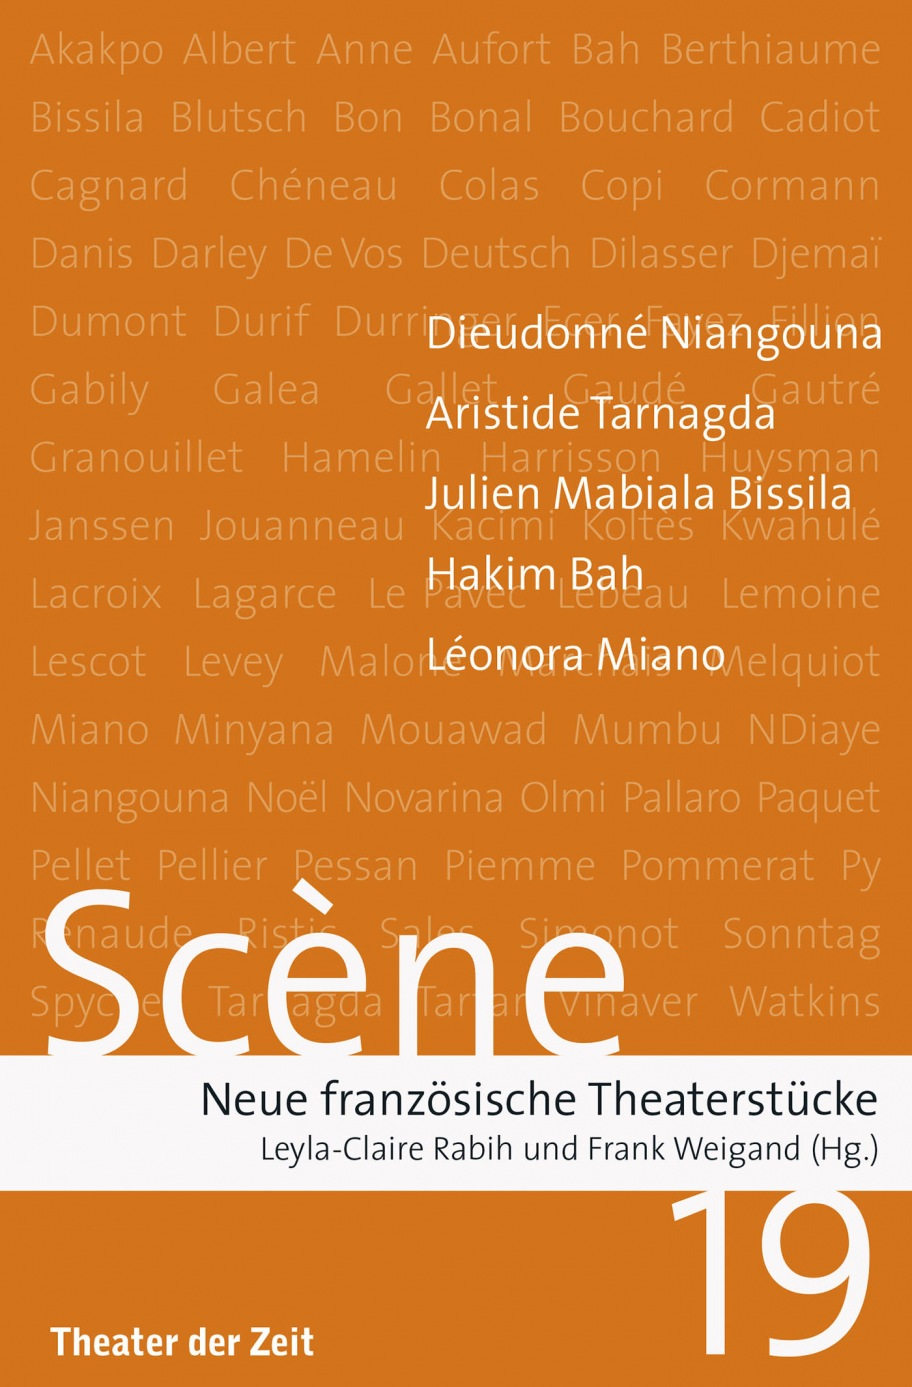 Scène 19